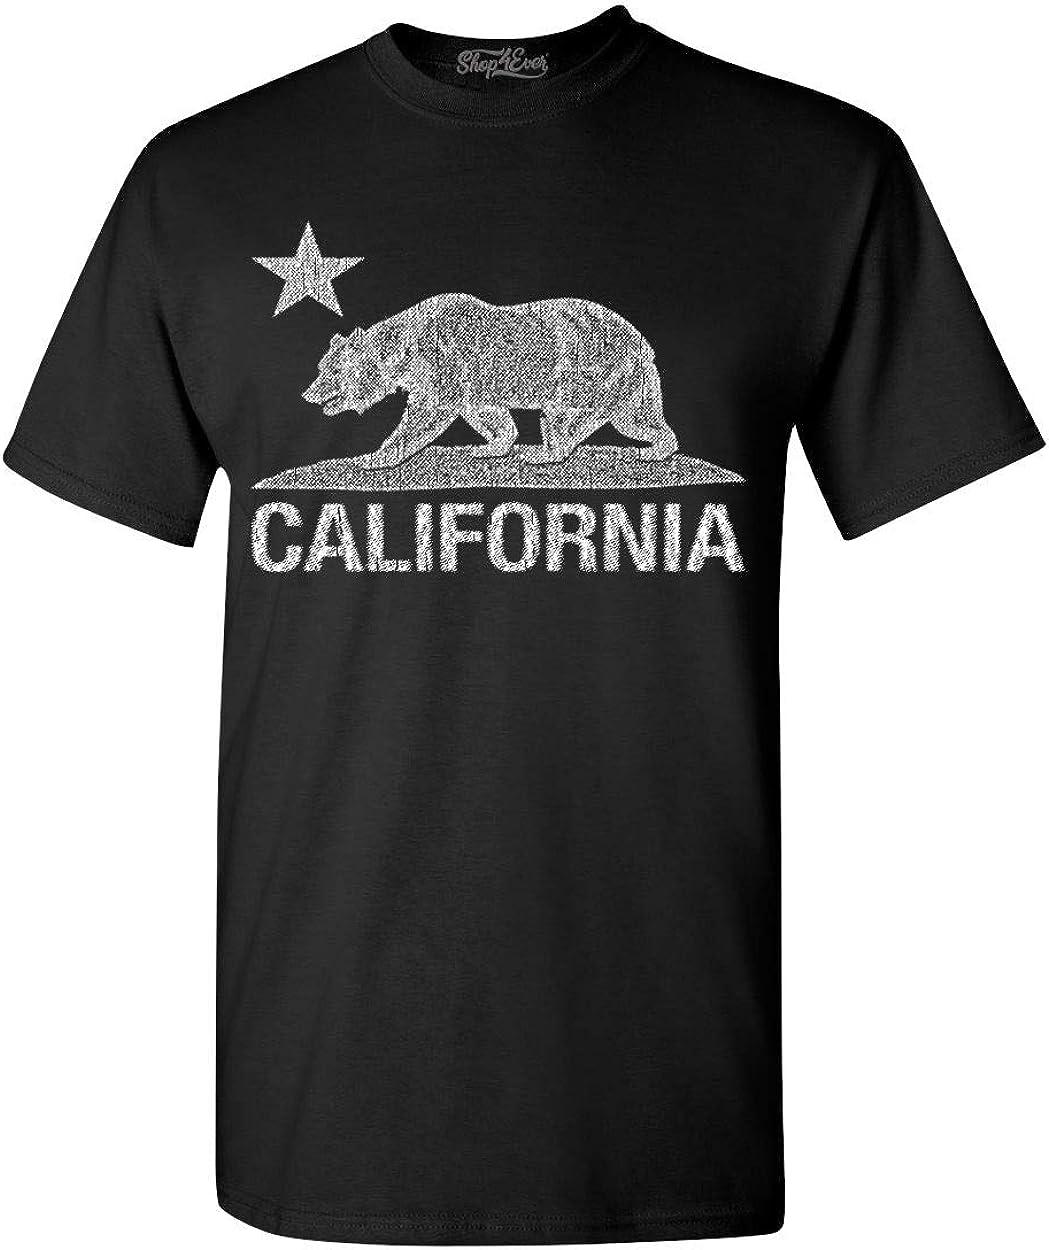 shop4ever California Distressed White Bear T-Shirt Cali Shirts